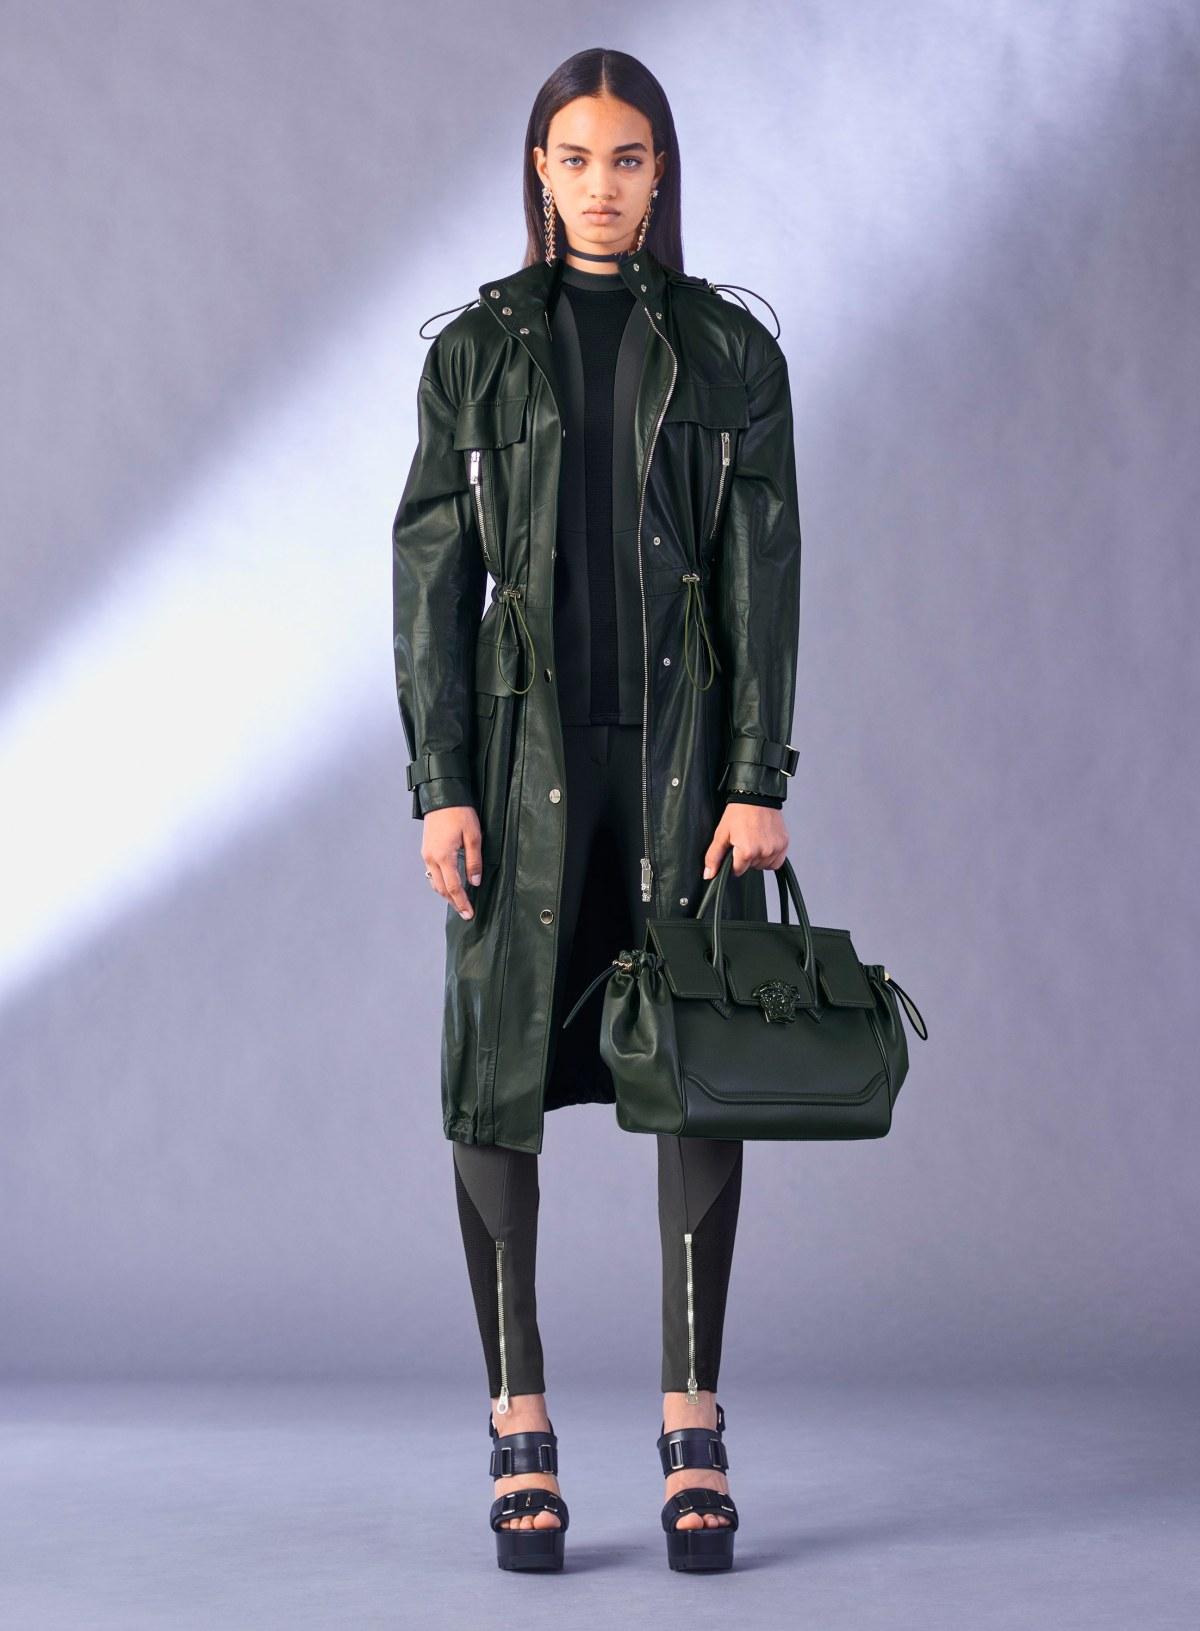 versace-pre-fall-2017-fashion-show-the-impression-06